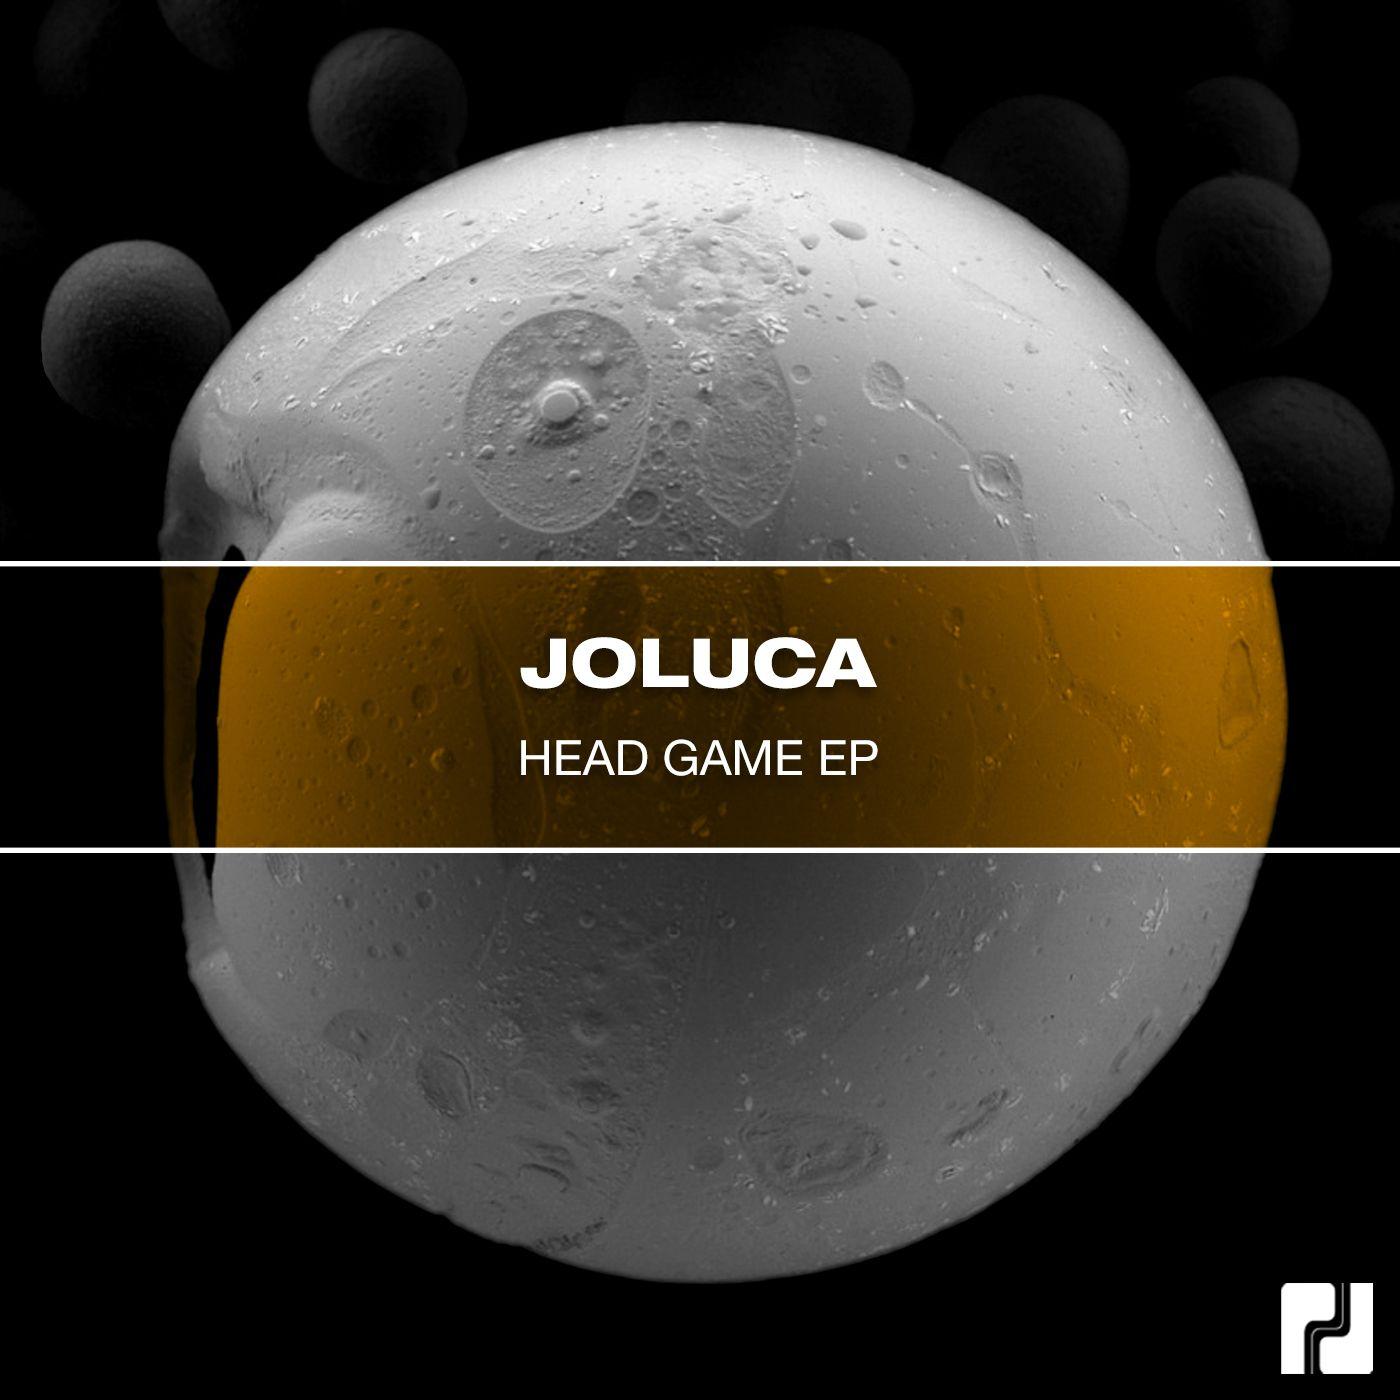 joluca_headgame_artwork.jpg